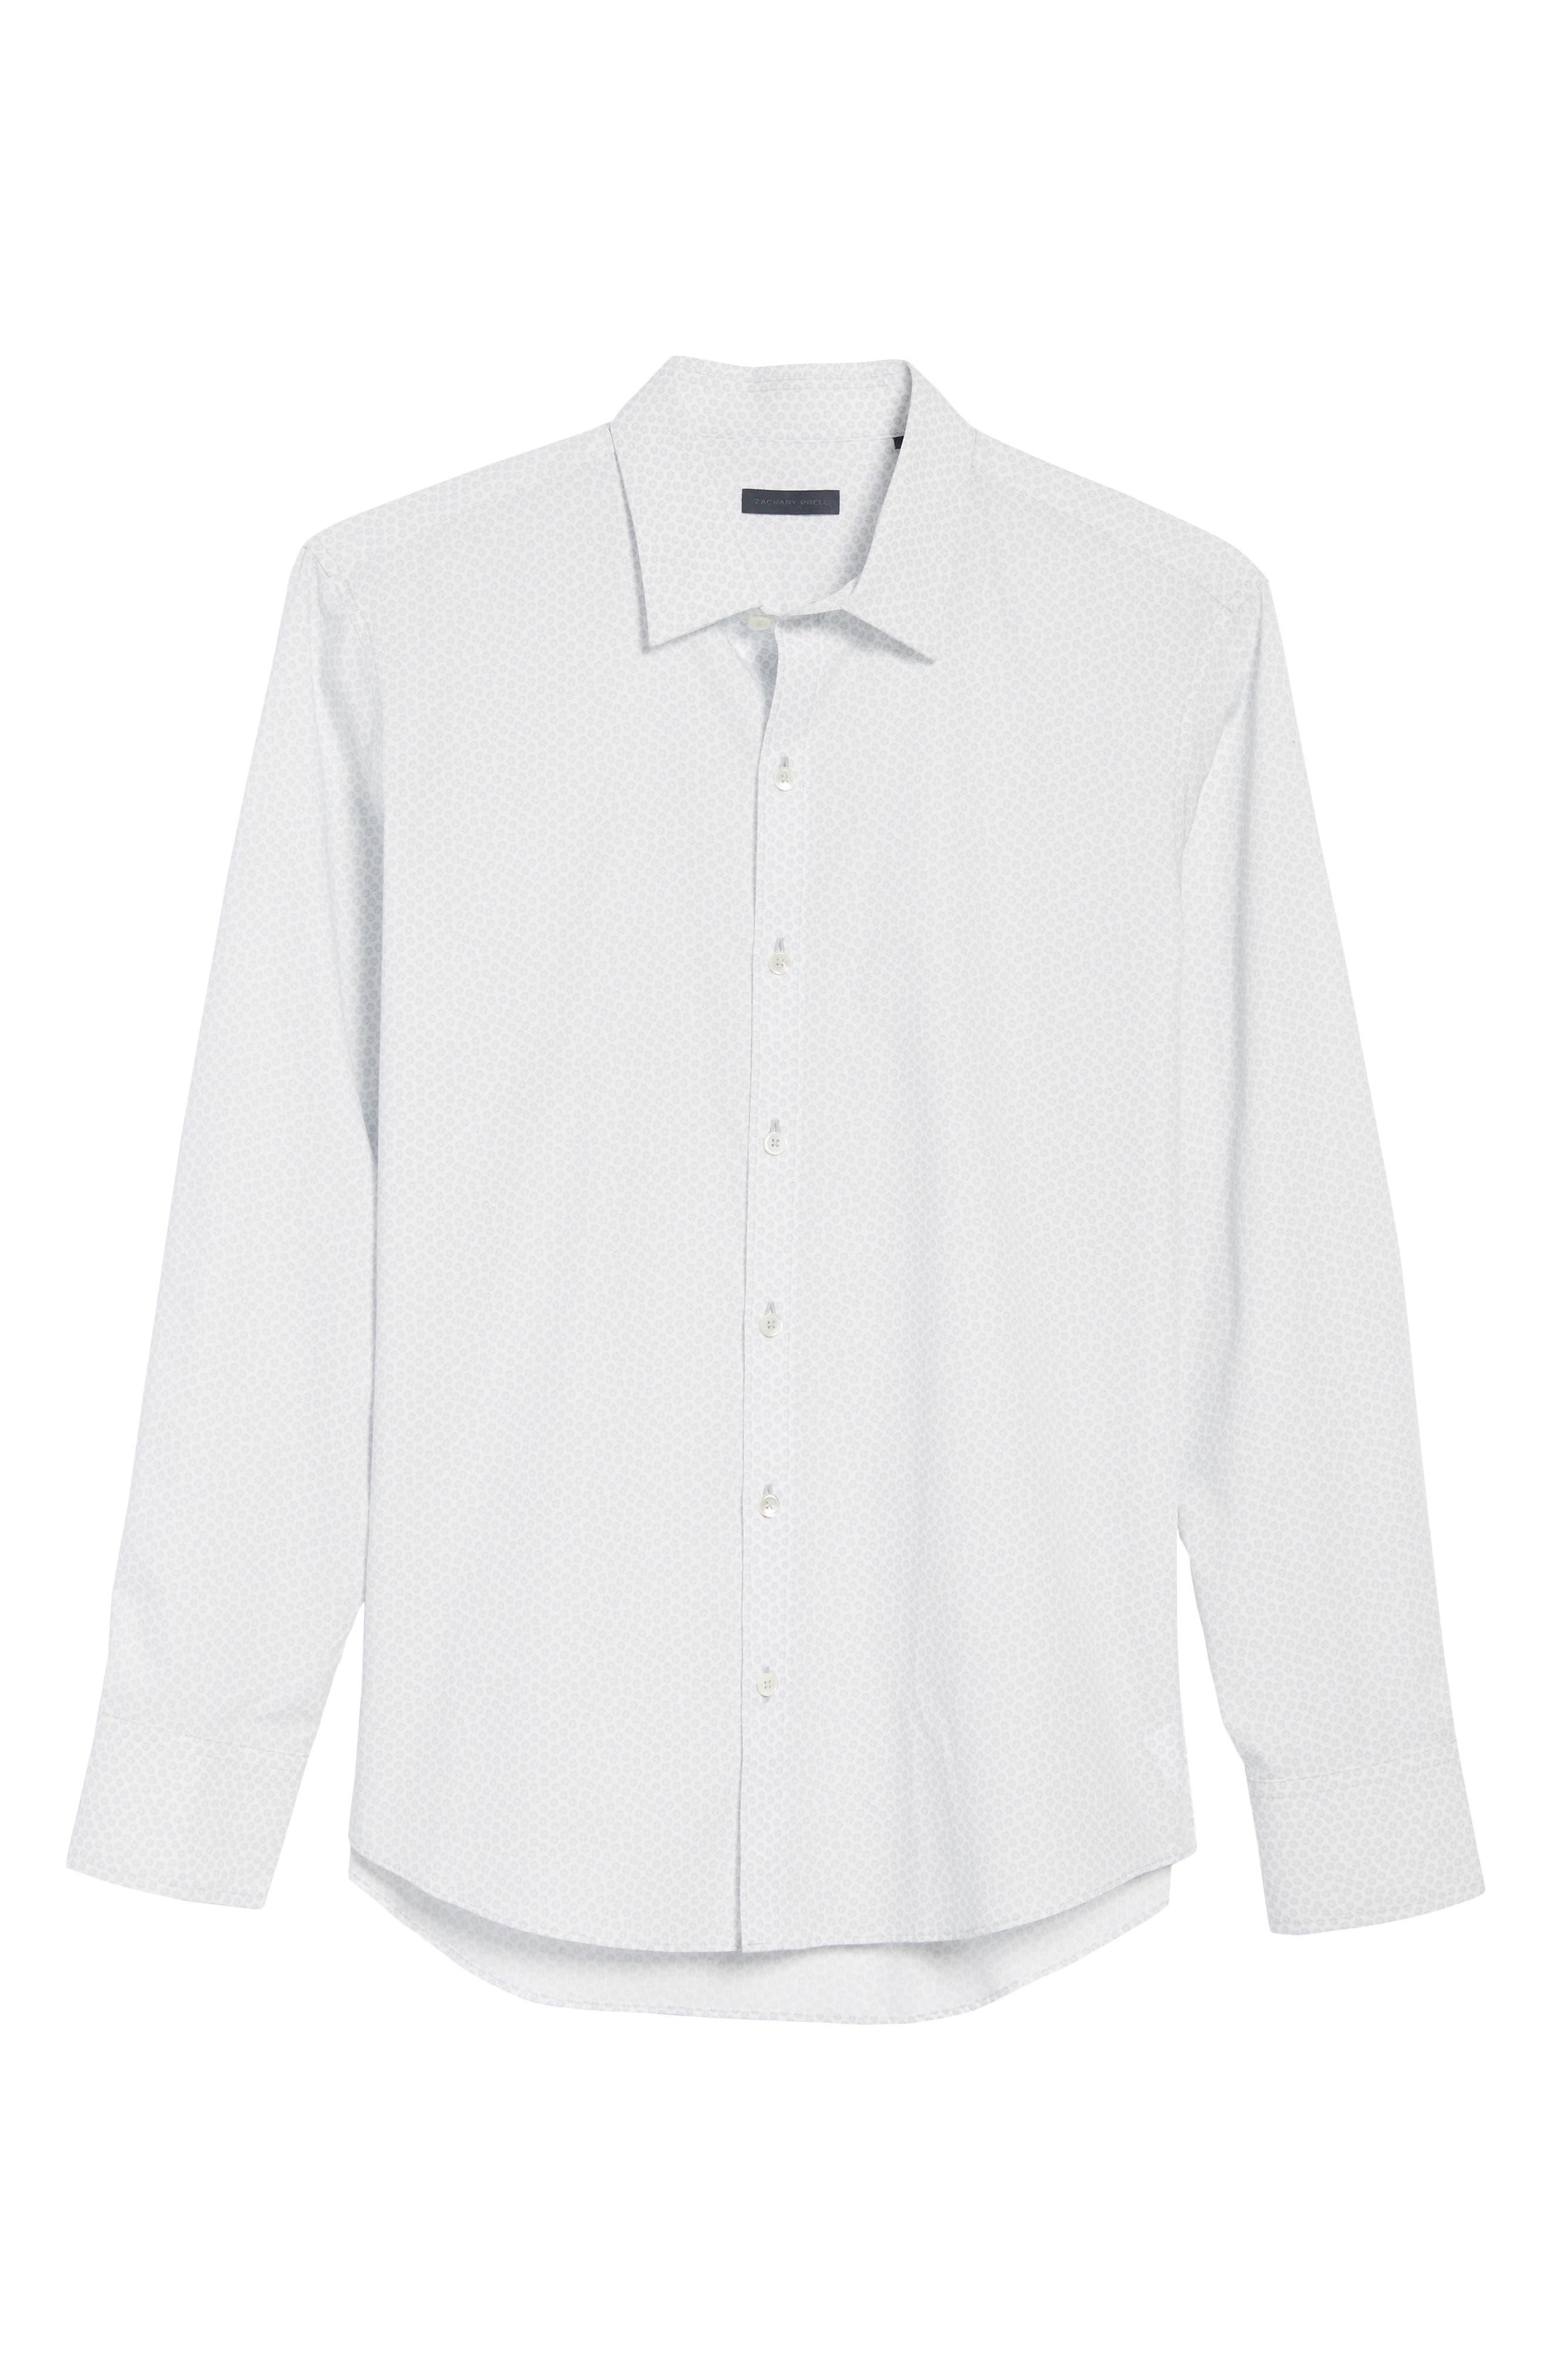 Owens Slim Fit Print Sport Shirt,                             Alternate thumbnail 6, color,                             100